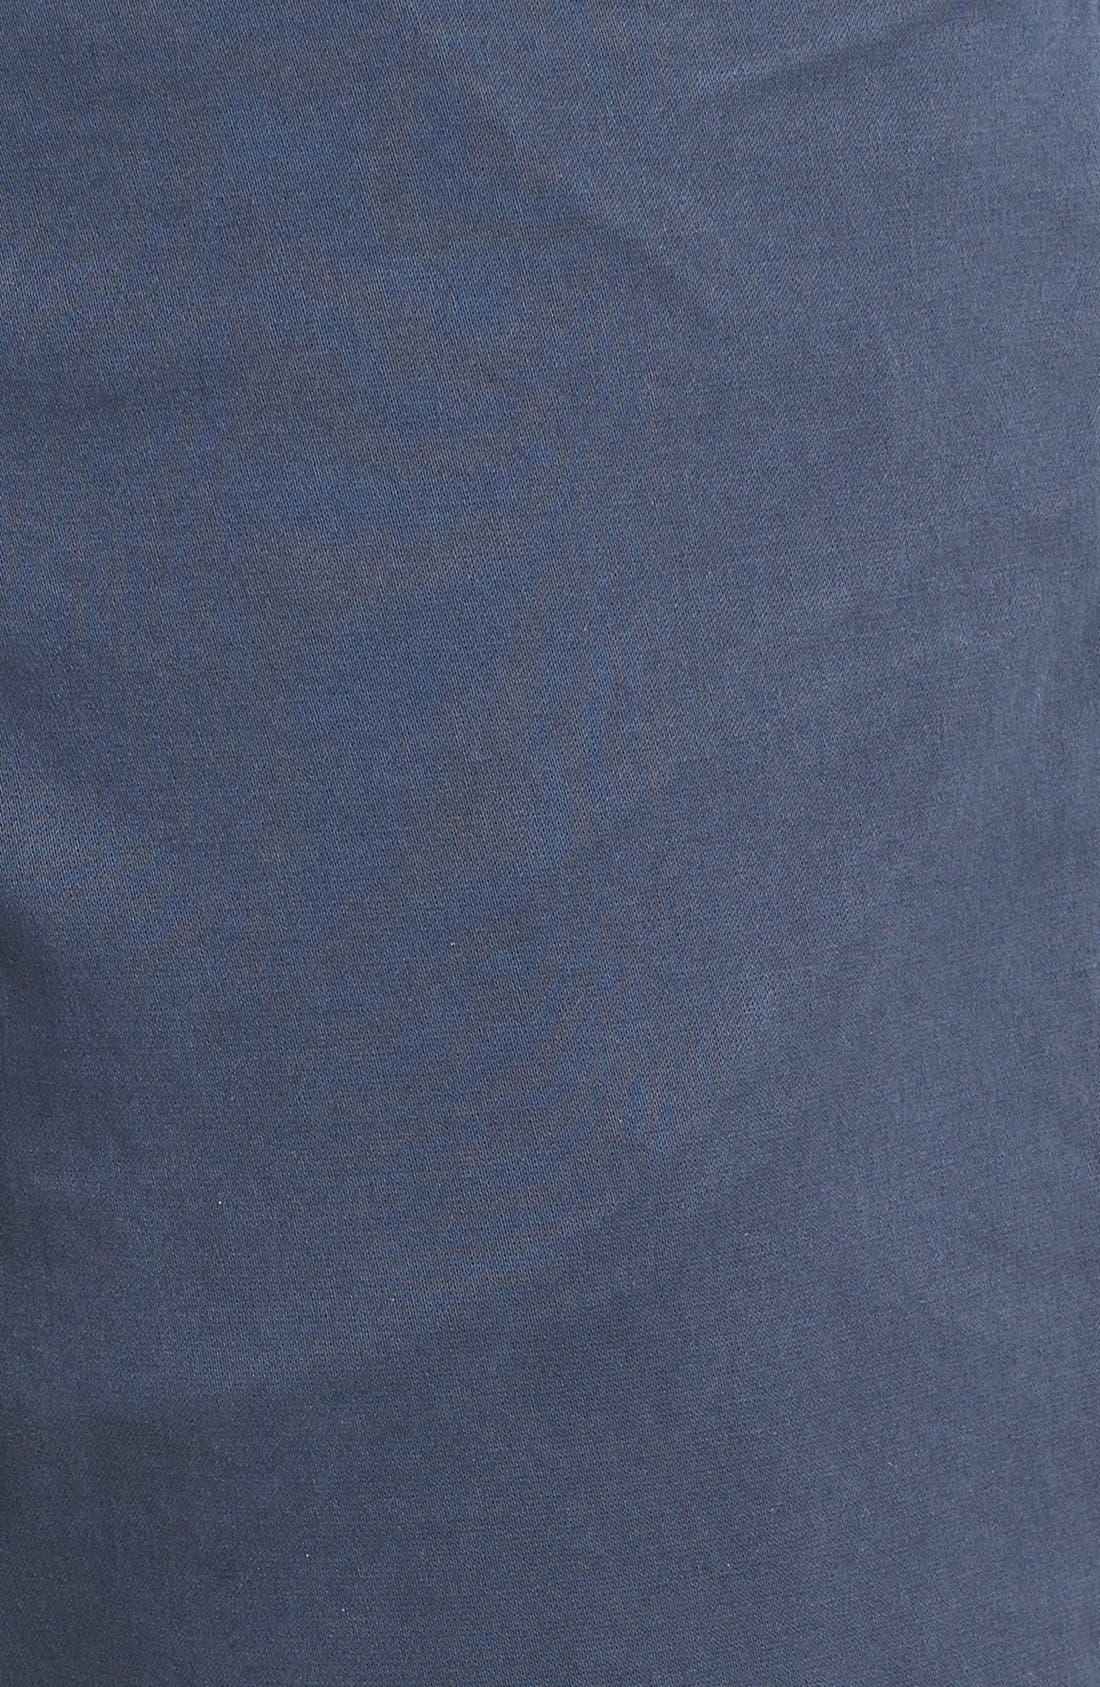 'Kane' Slim Fit Cotton Twill Pants,                             Alternate thumbnail 37, color,